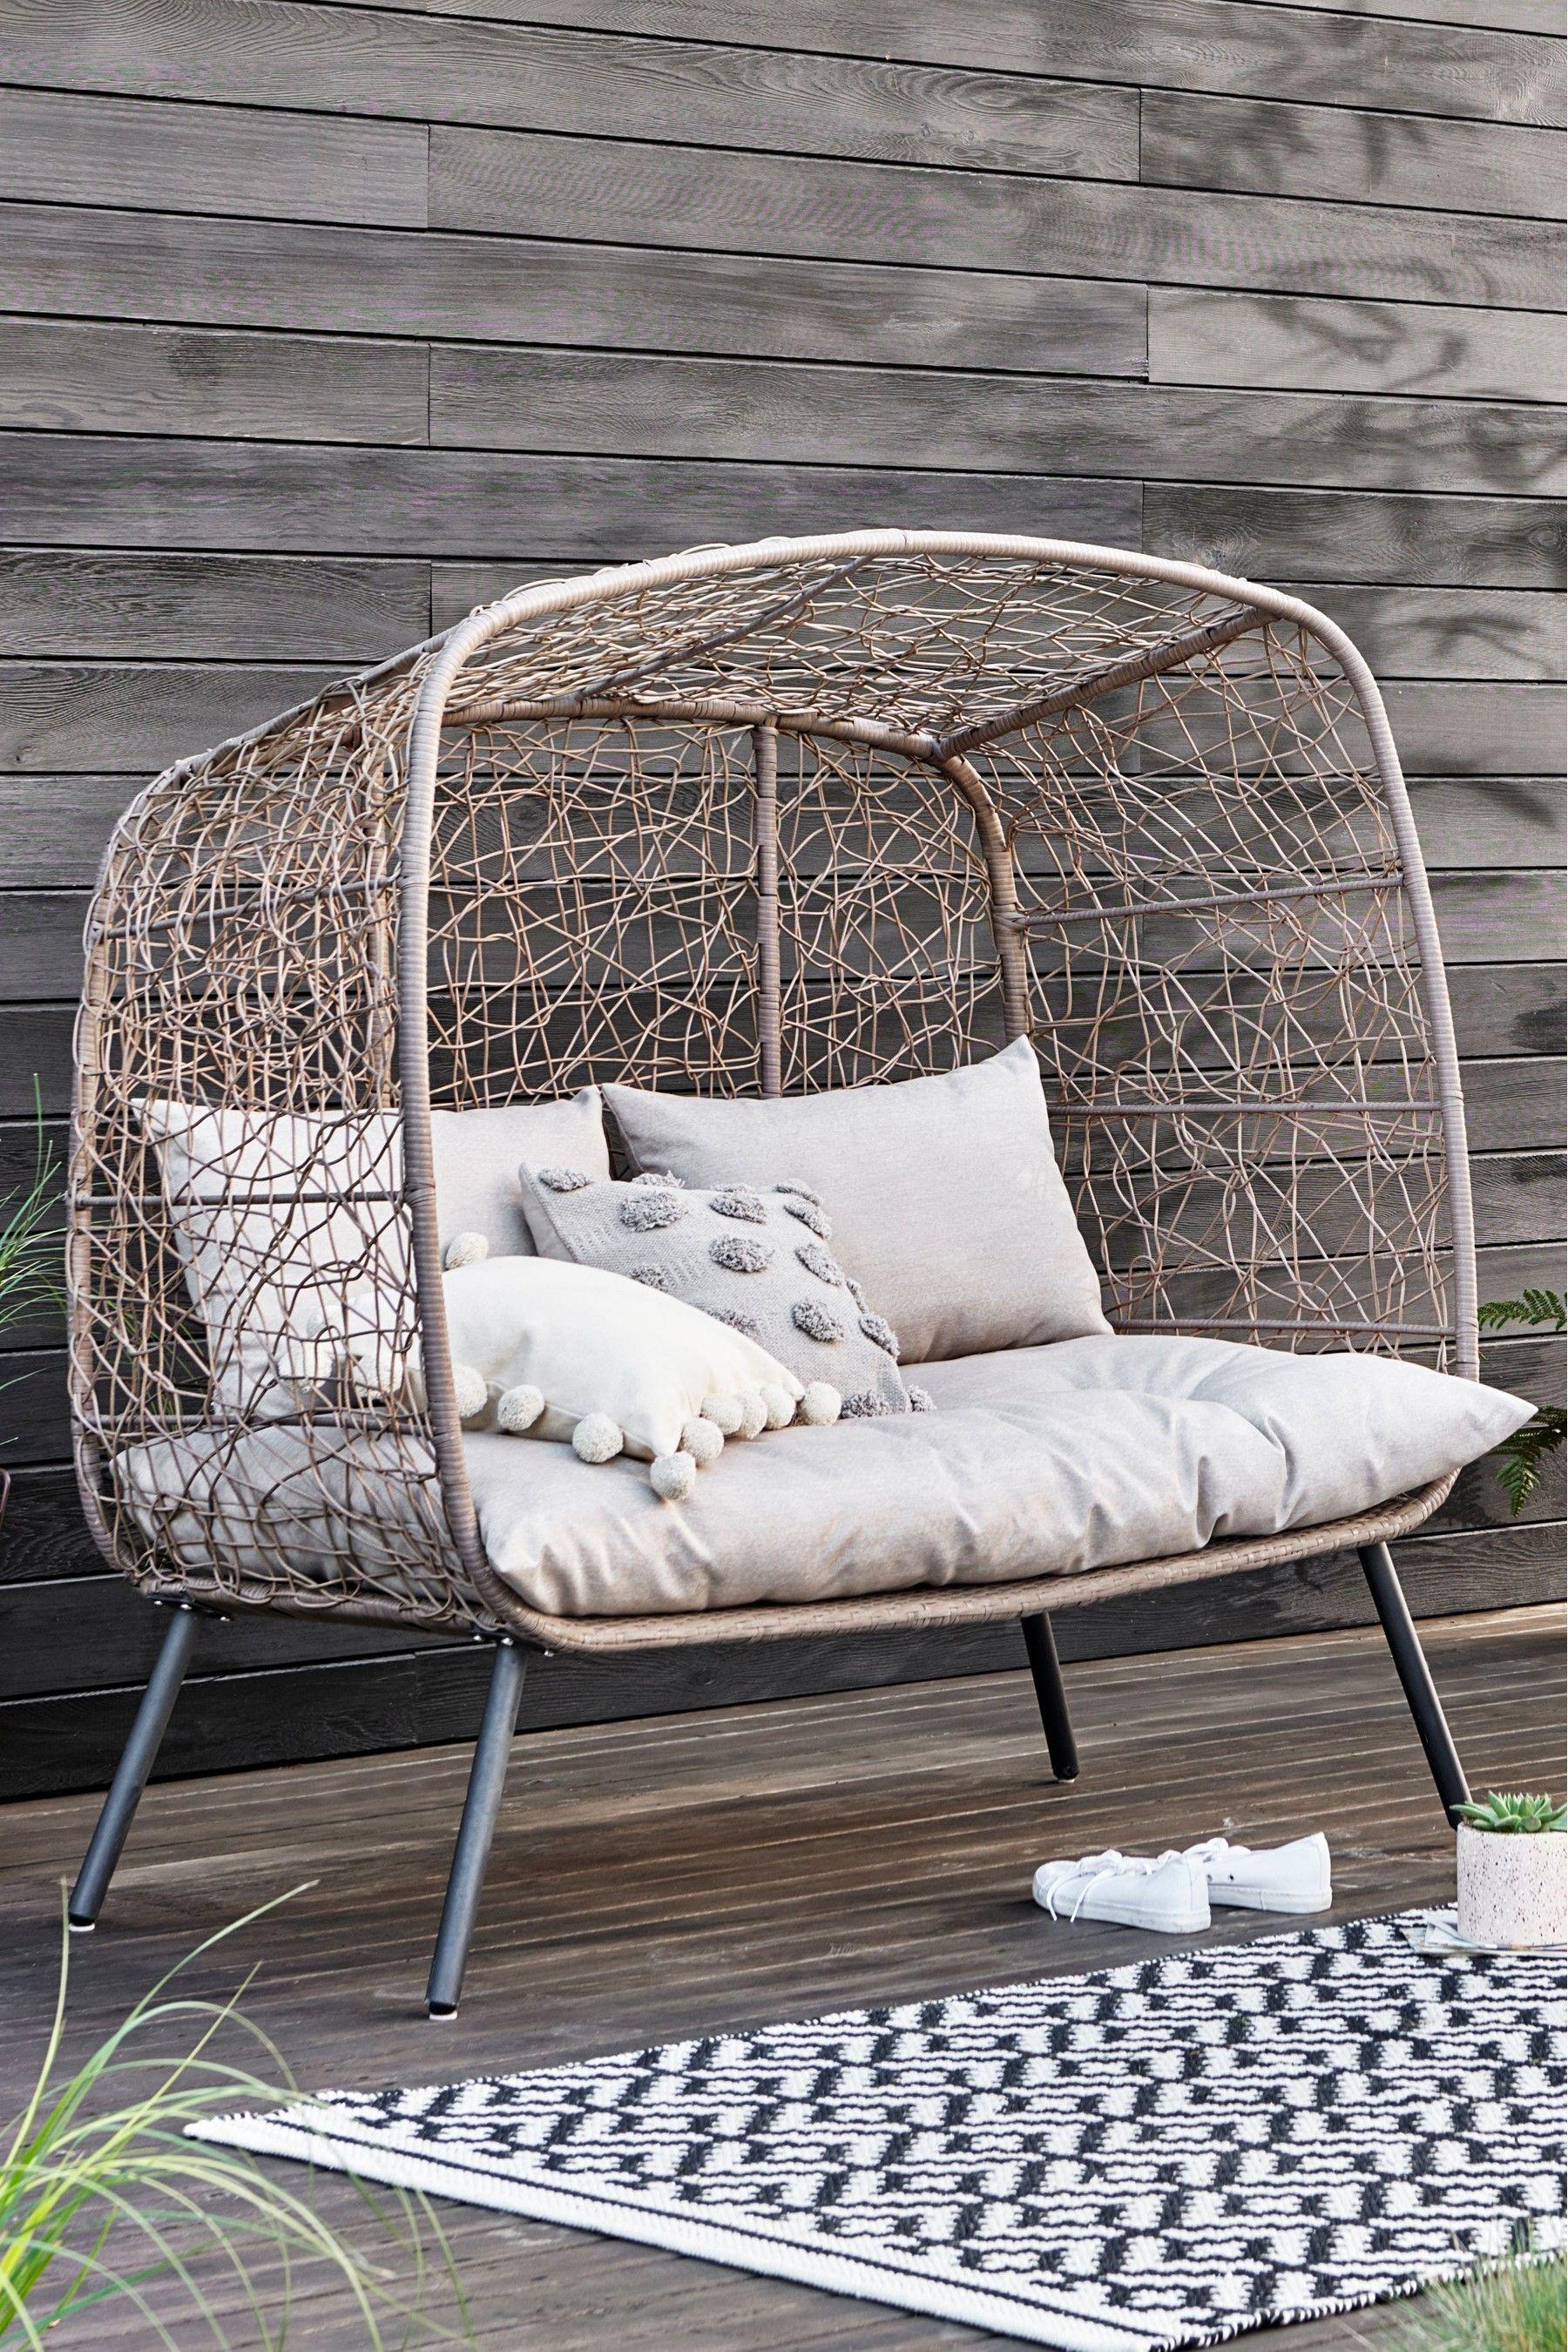 Best Kerala Sofa By Charles Bentley In 2020 Outdoor Furniture 400 x 300